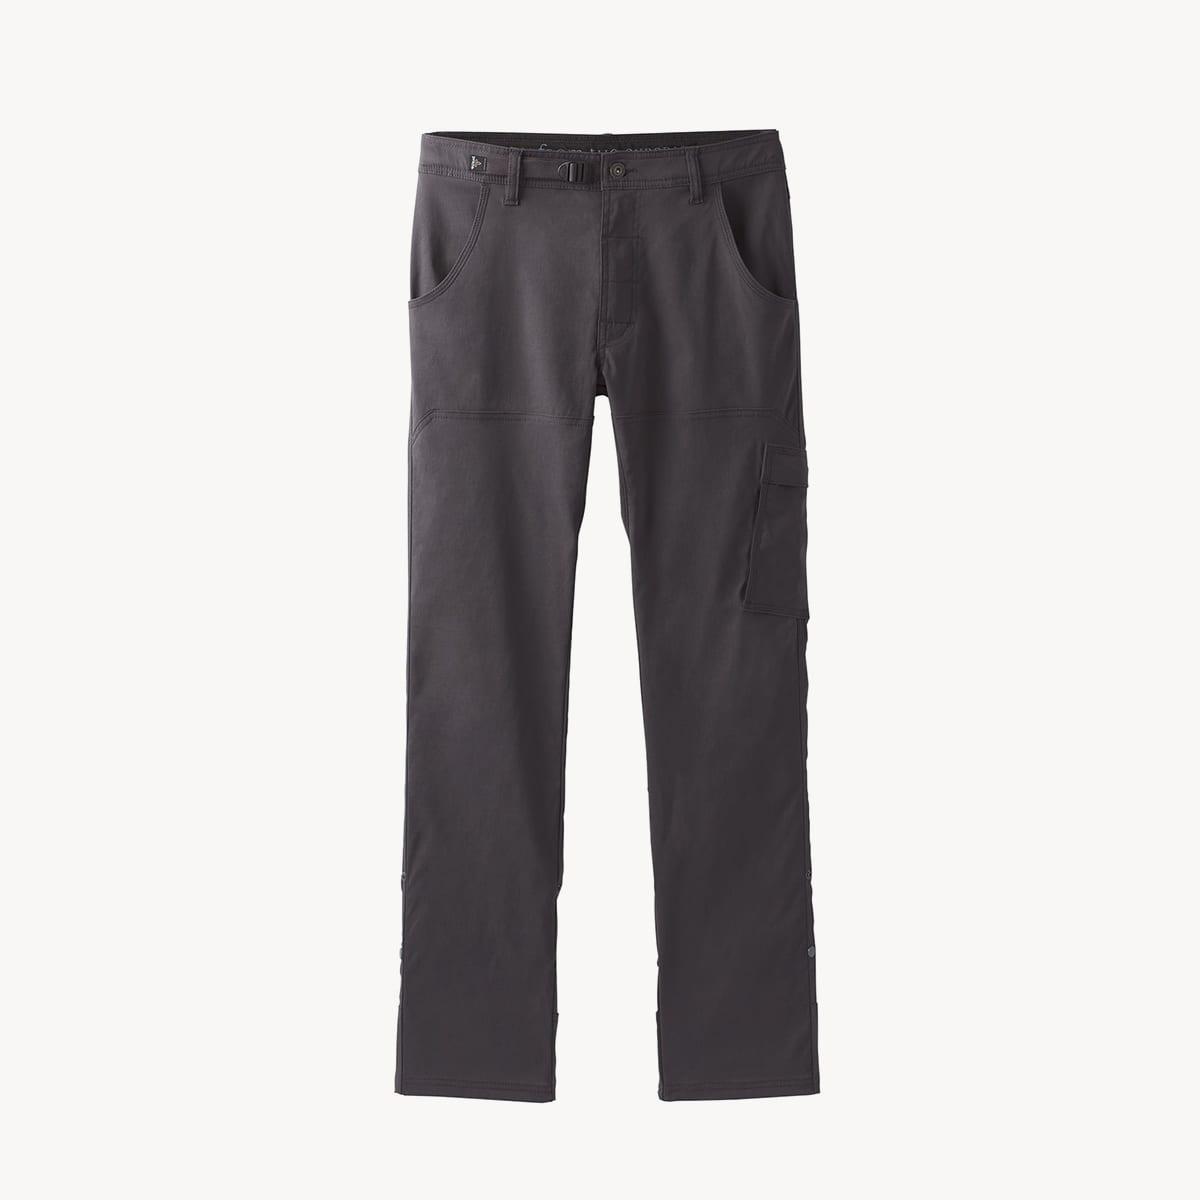 81af9e6de49 Best Adventure Hiking Travel Pants  Prana Stretch Zion Straight ( 89)